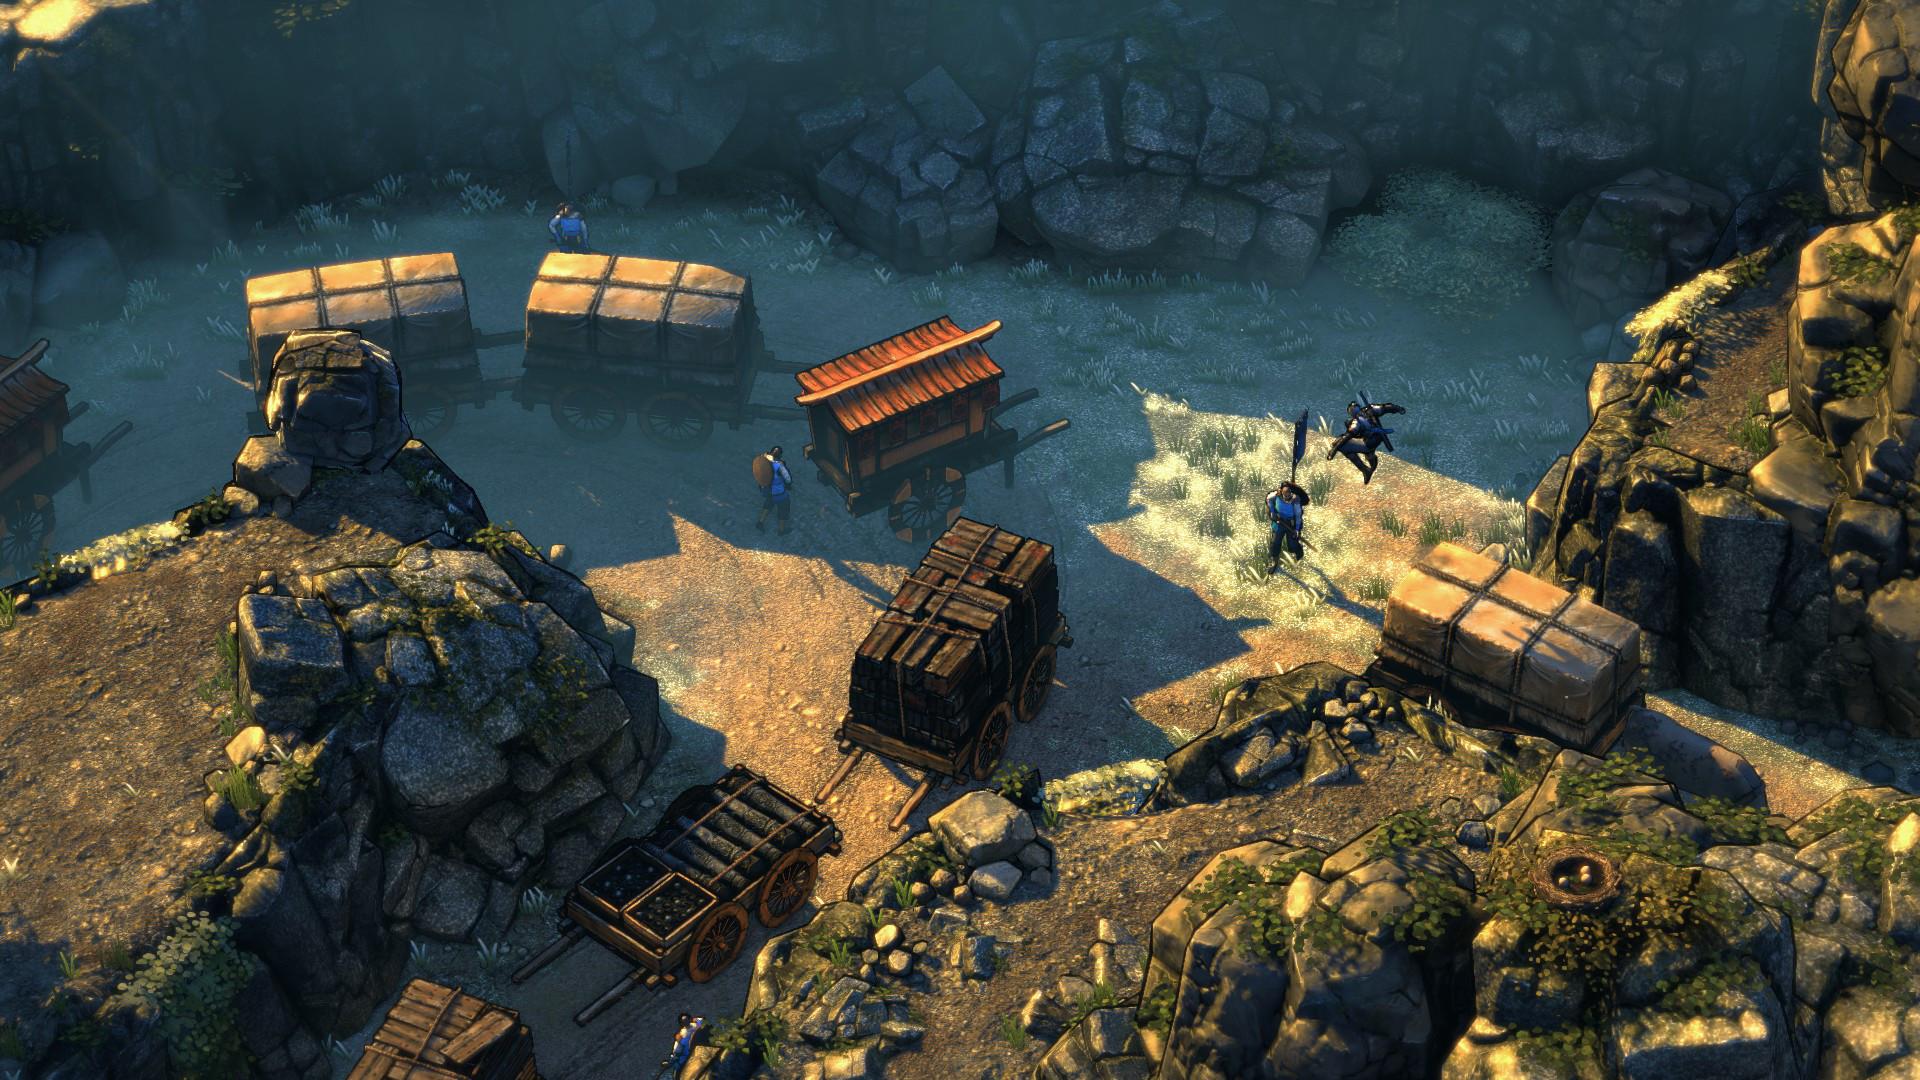 Shadow Tactics: Blades of the Shogun Screenshot 2